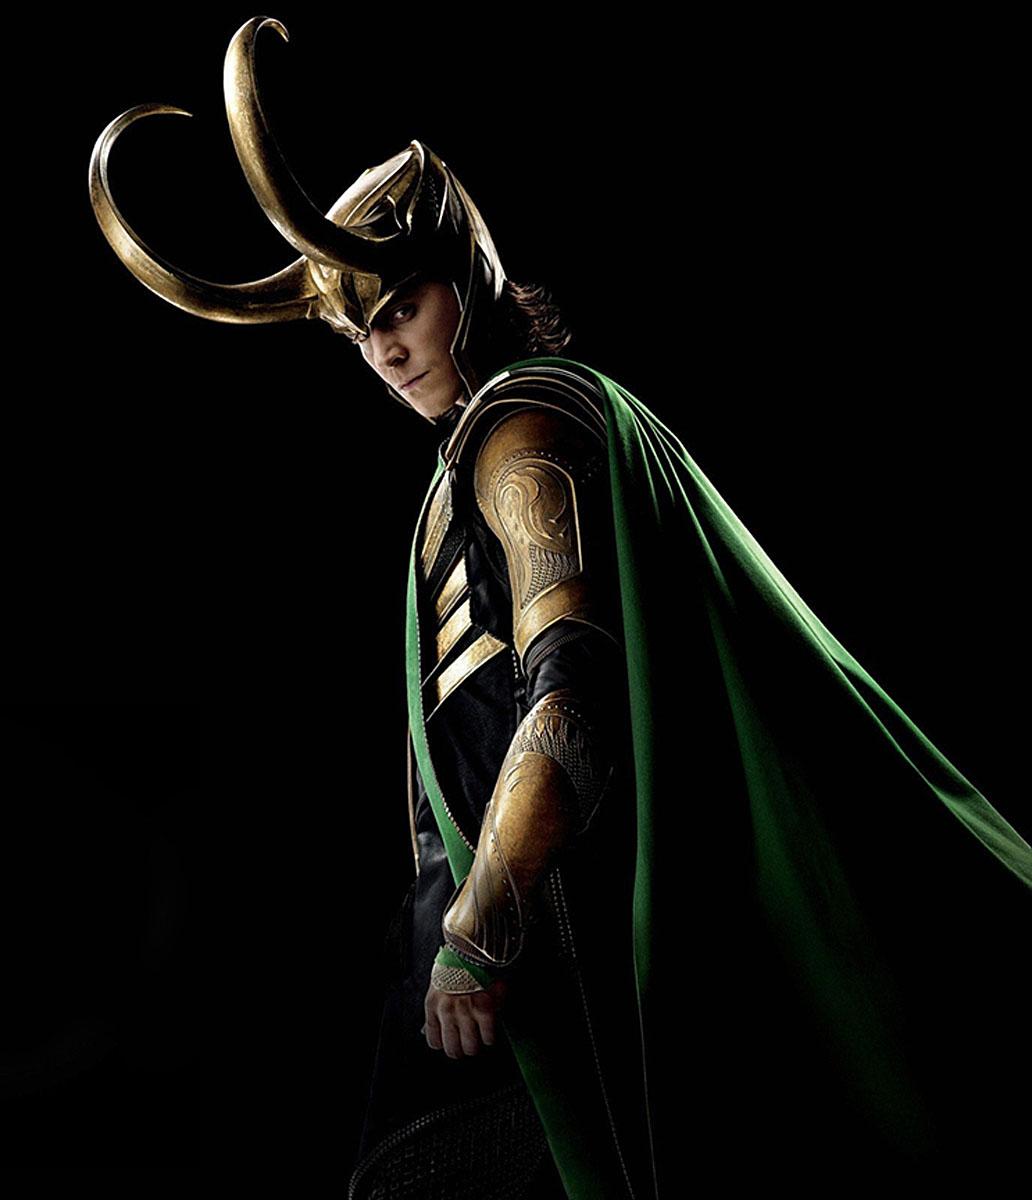 Loki wallpapers, Comics, HQ Loki